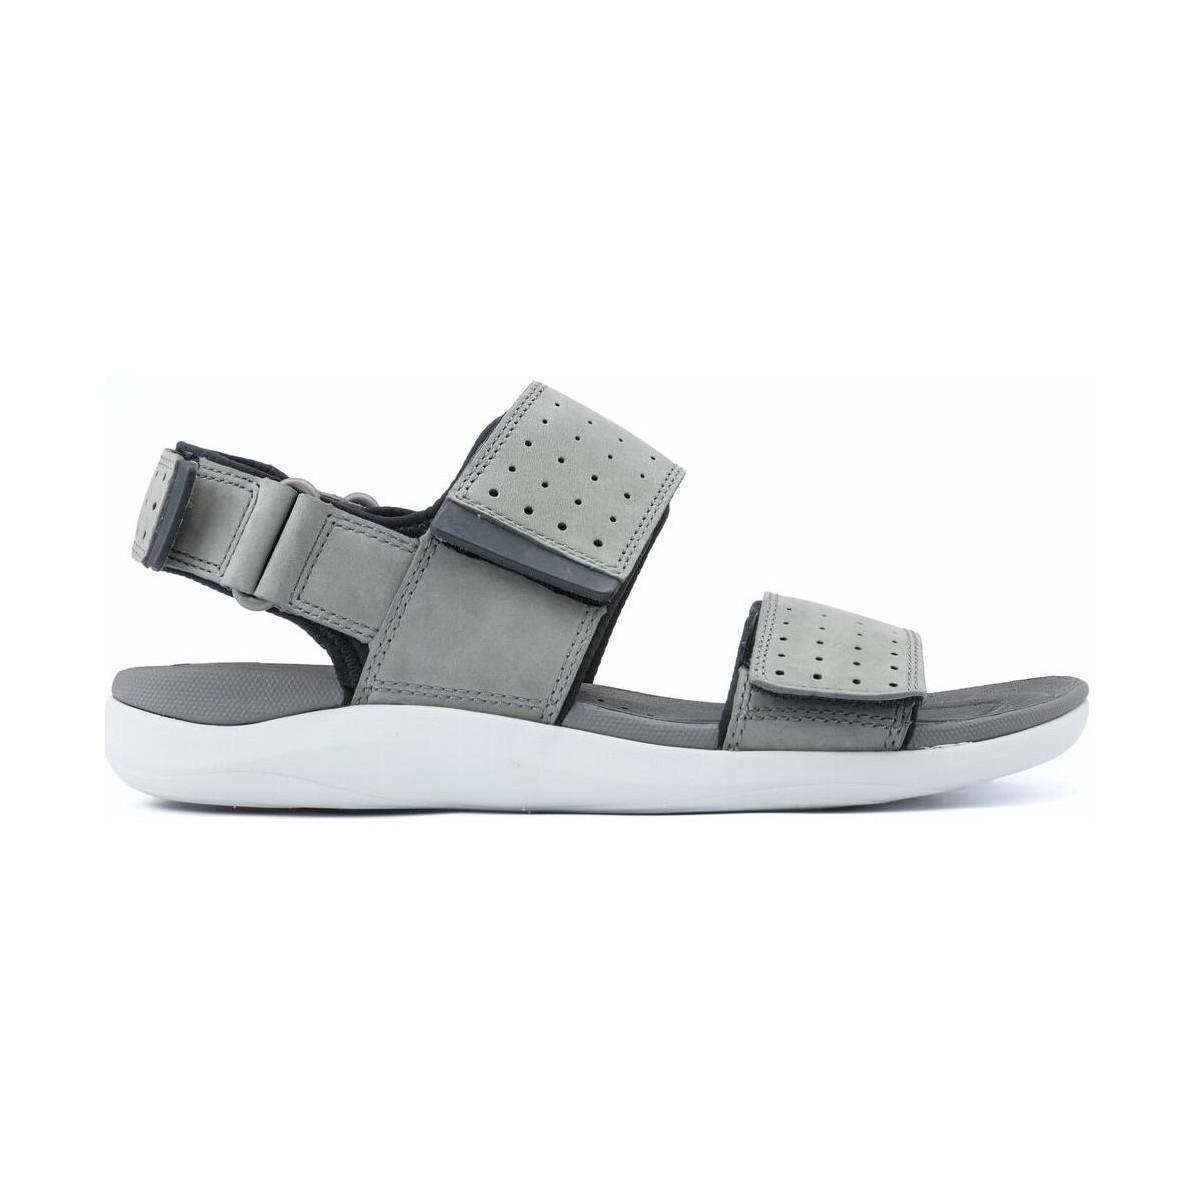 e7e49f9fb2e5 Clarks - Multicolor Garratt Active 2613 Sandals Men s Sandals In  Multicolour for Men - Lyst. View fullscreen